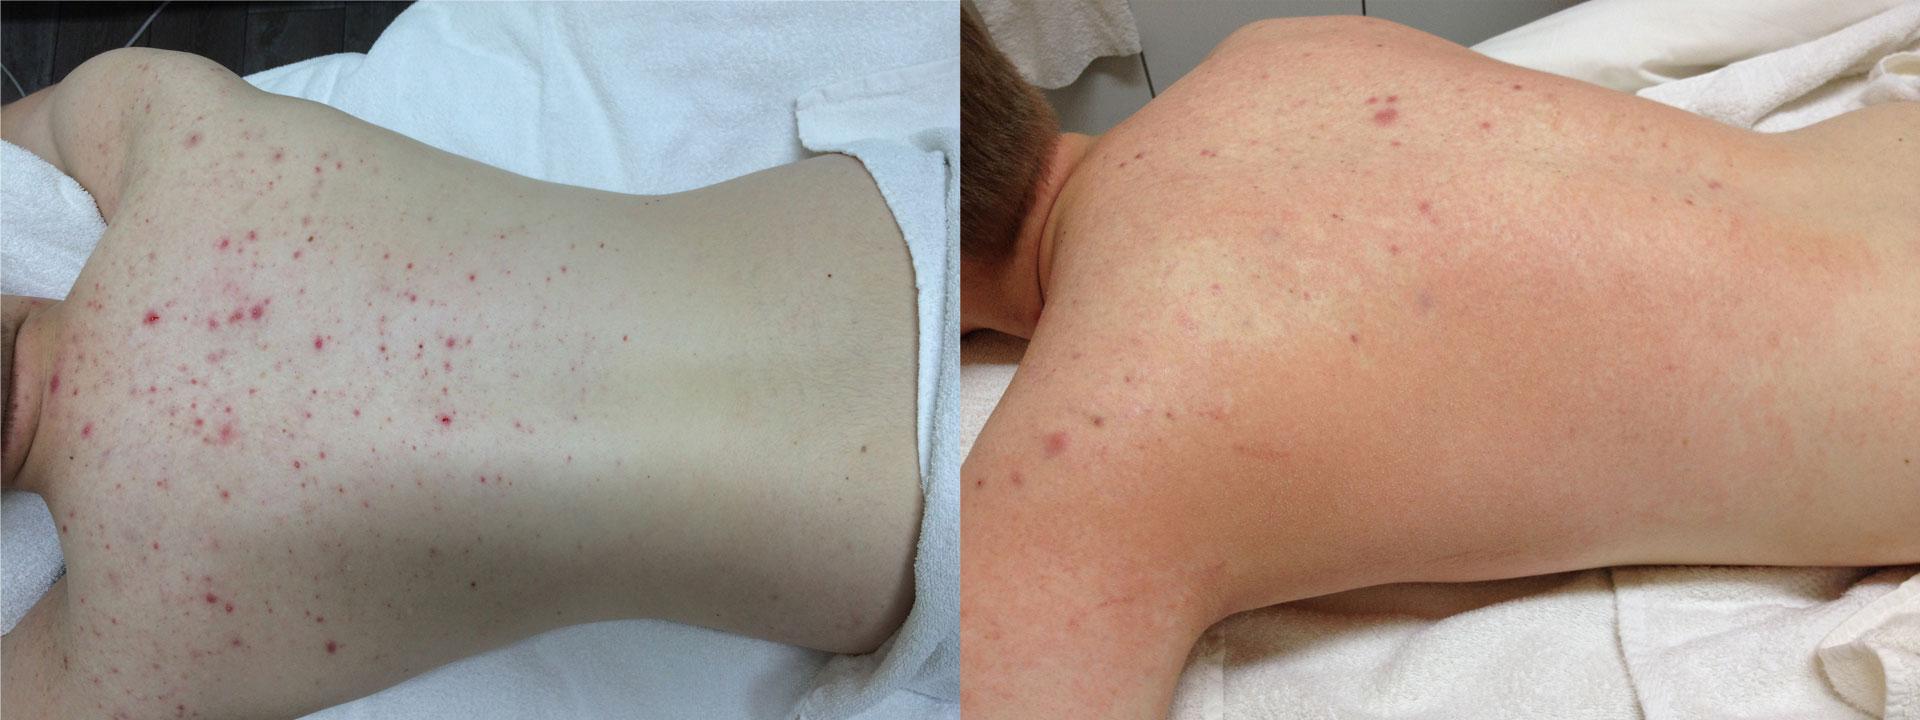 bumser på ryggen behandling